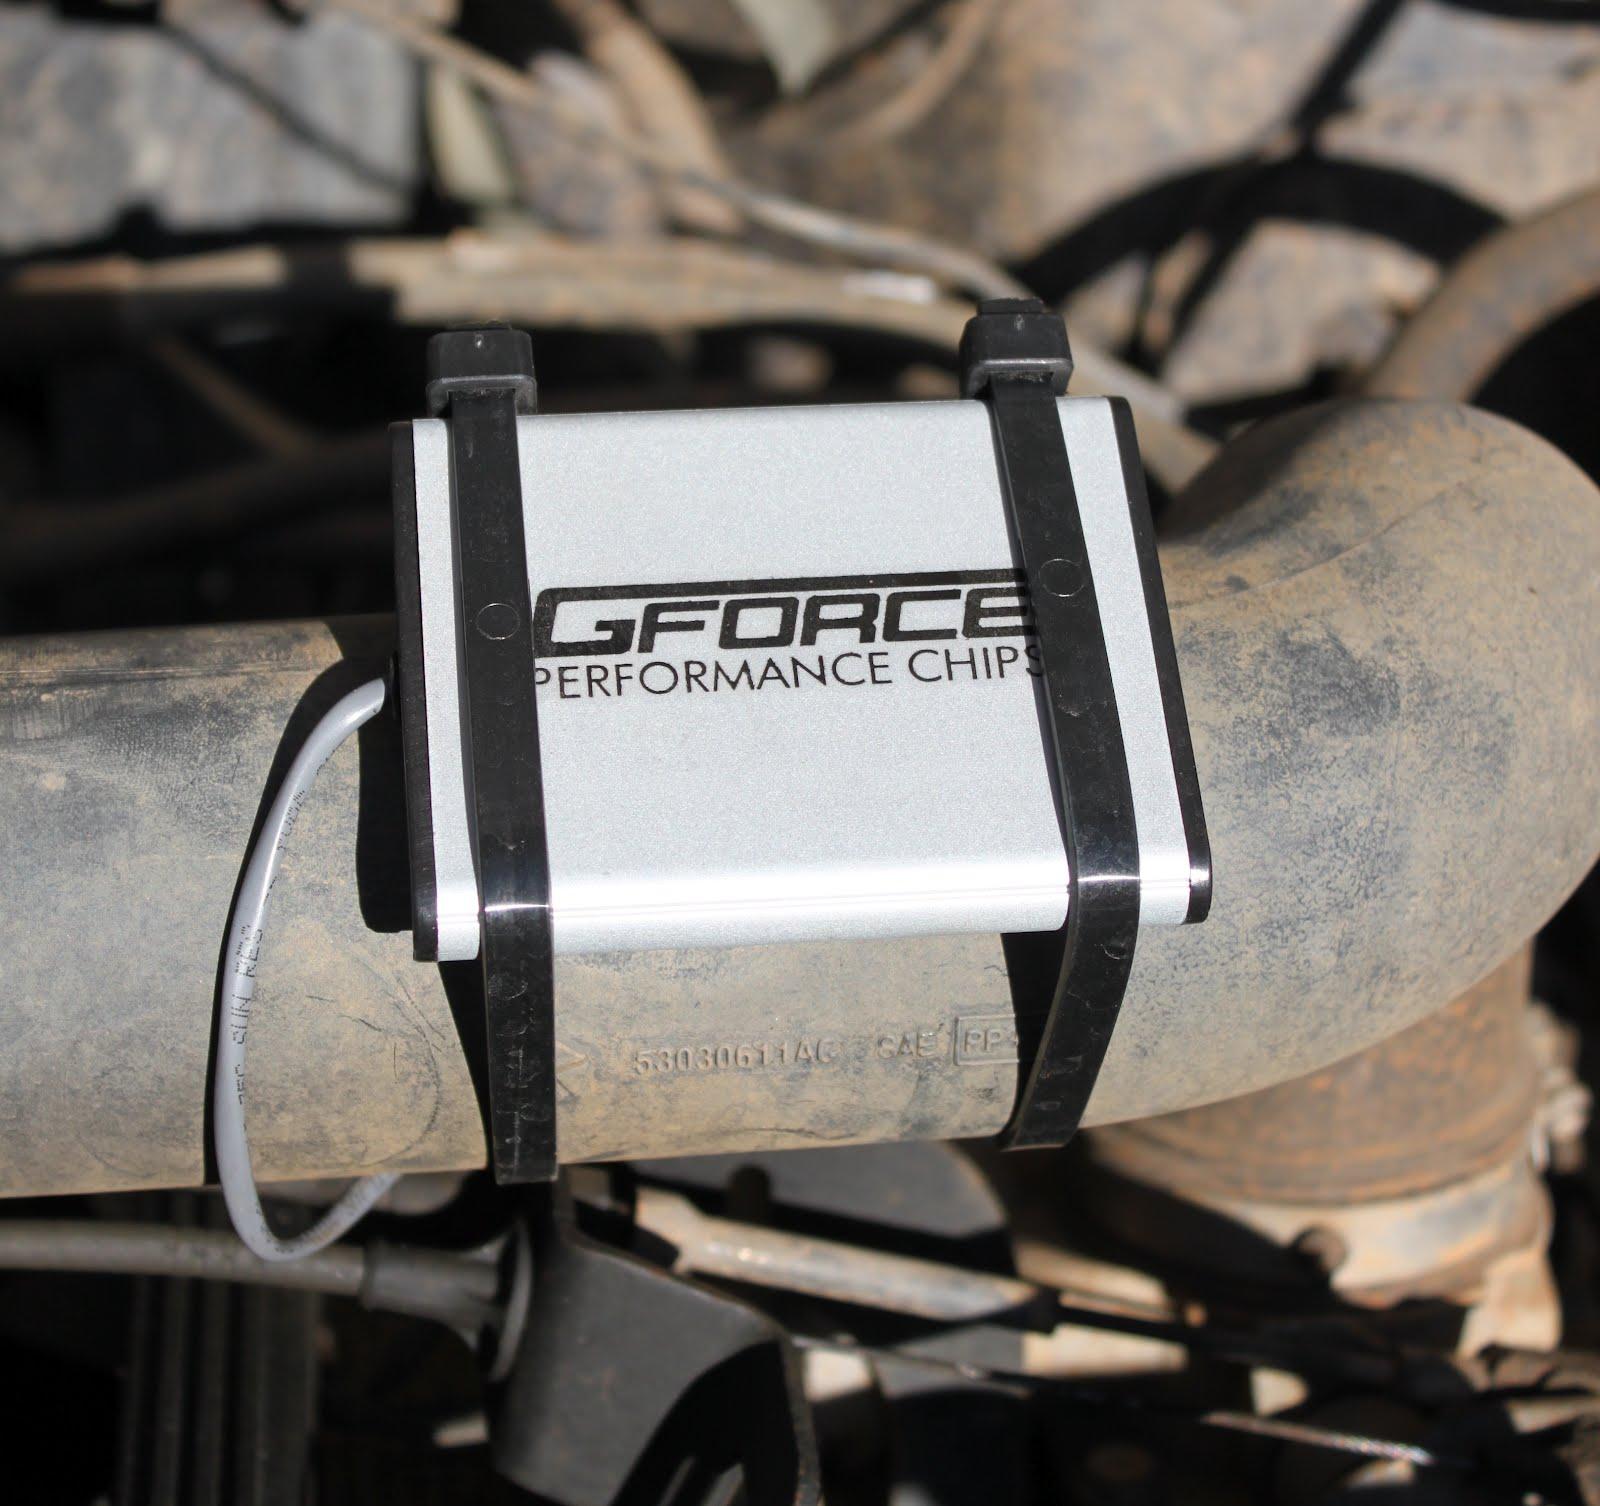 Gforce Performance Chips Photos